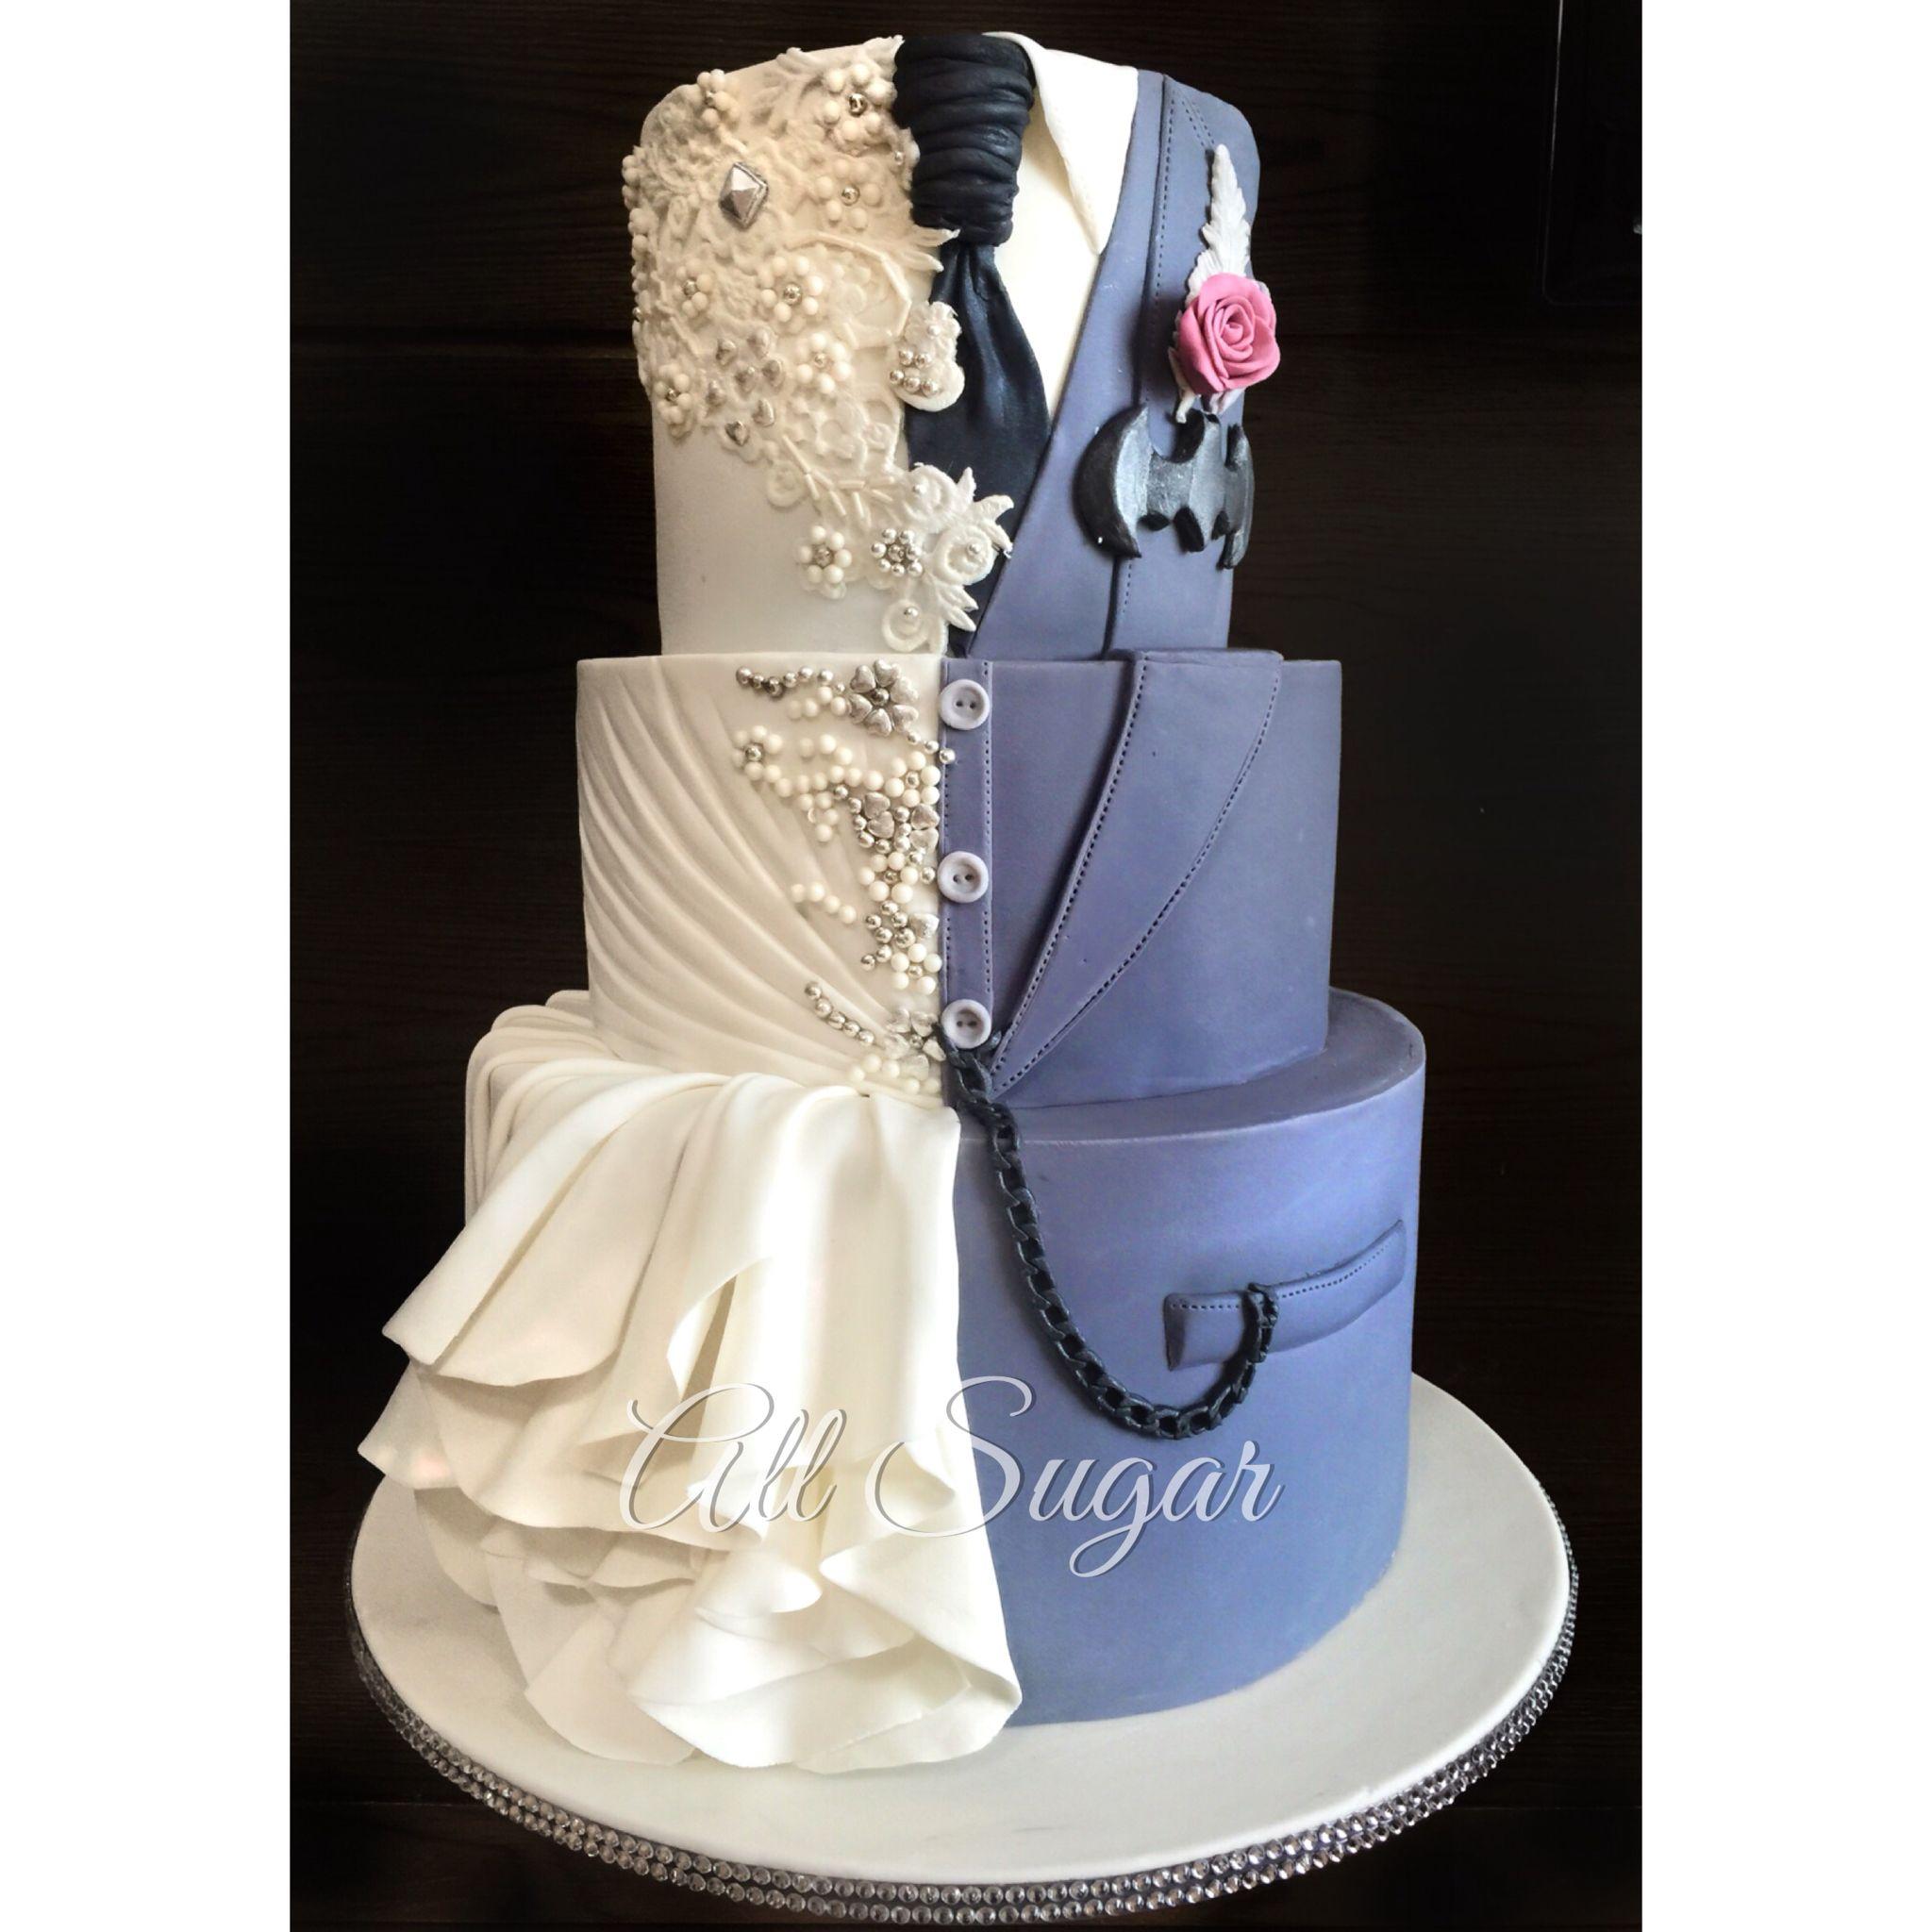 Custom wedding cake Wedding dress inspired wedding cake Dual design wedding cake Superhero